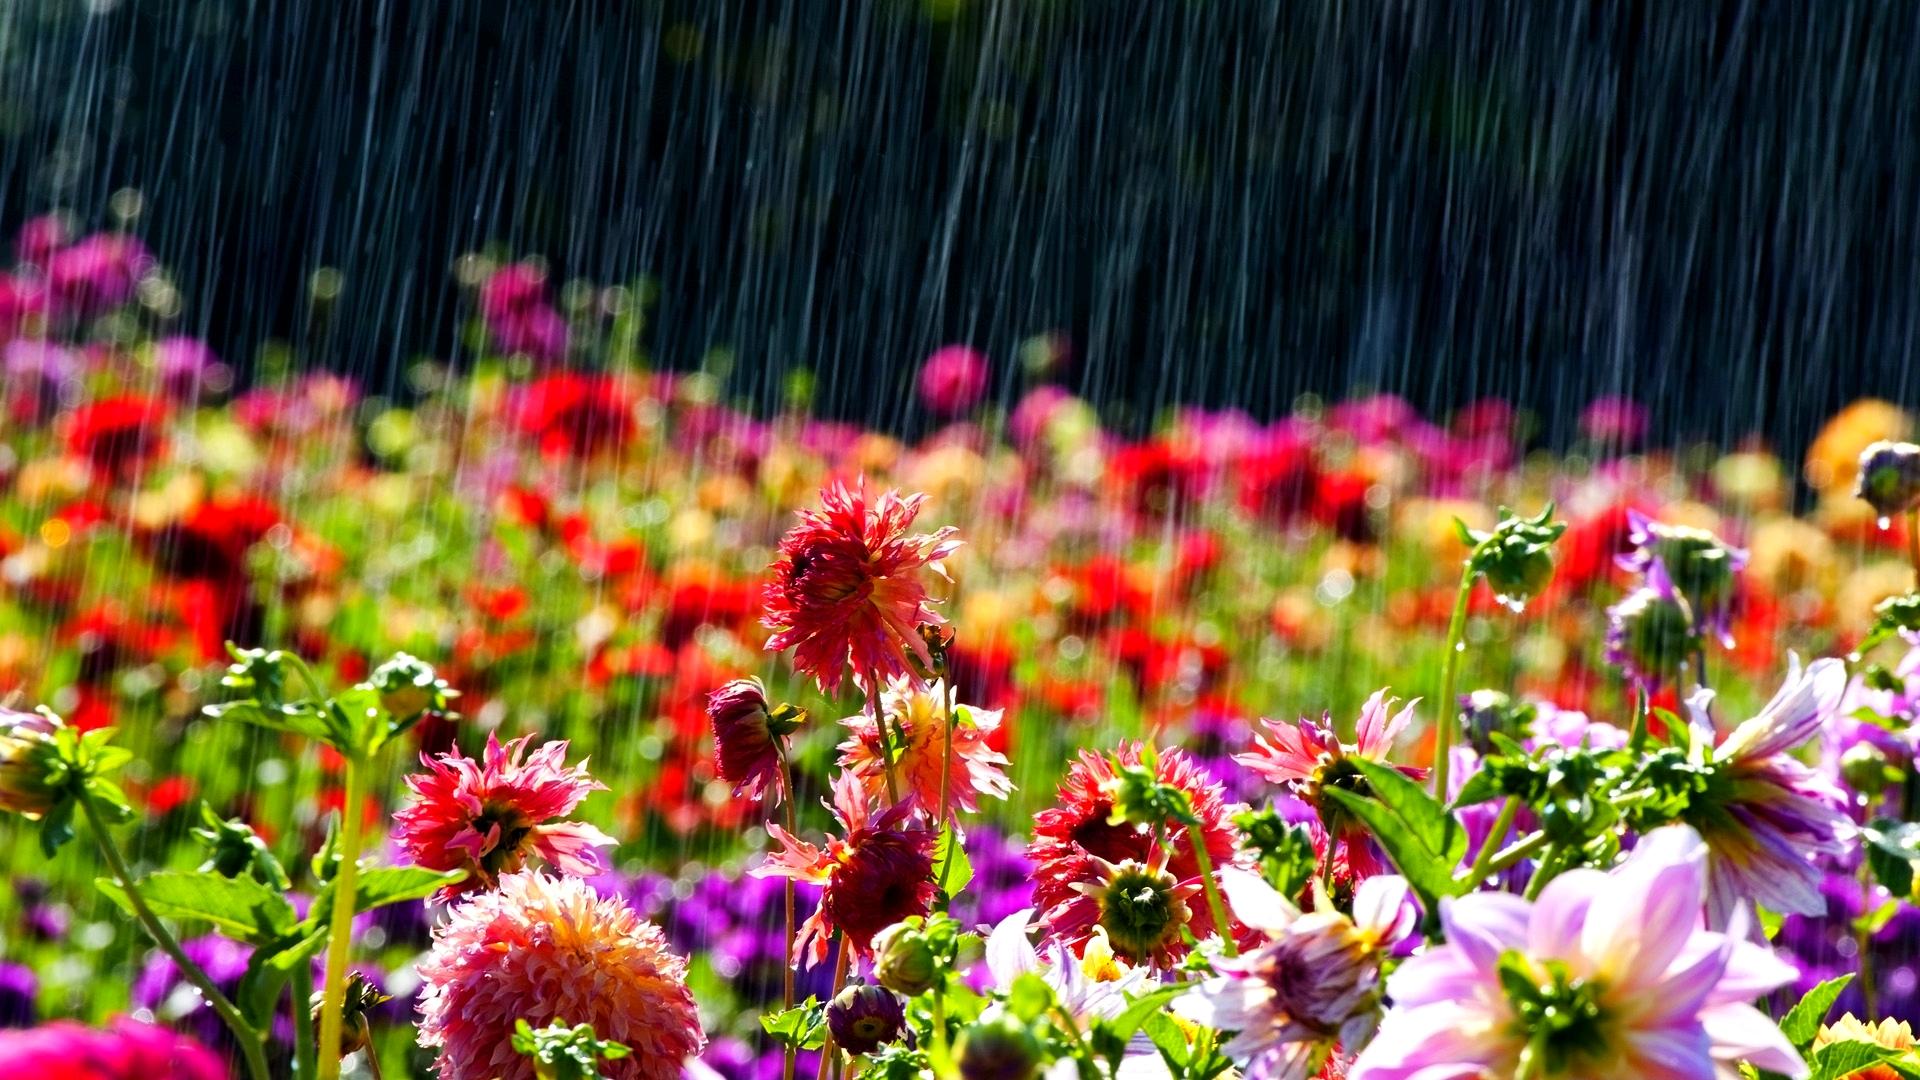 картинки на рабочий стол летний дождь уже